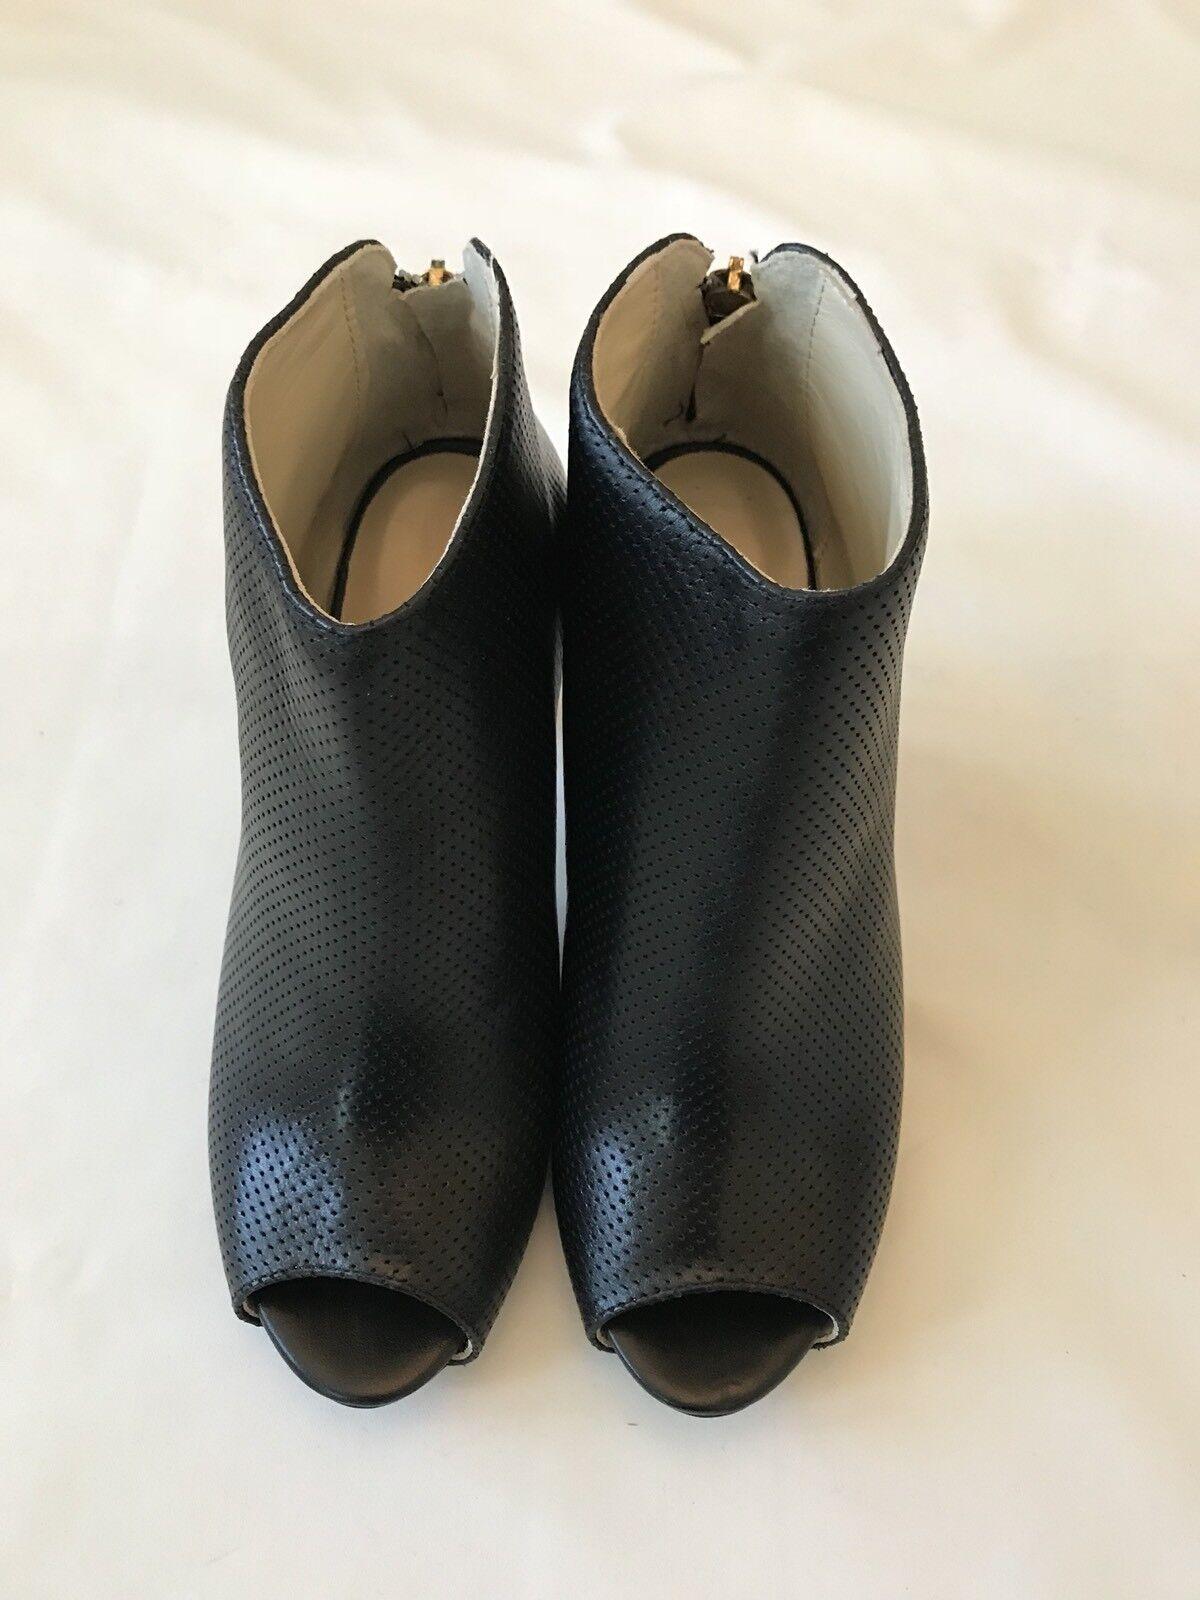 LA LA LA PERLA LEATHER OPEN TOES StiefelIES schuhe Ankle SZ 39 (US 8.5-9) schwarz   8c667b